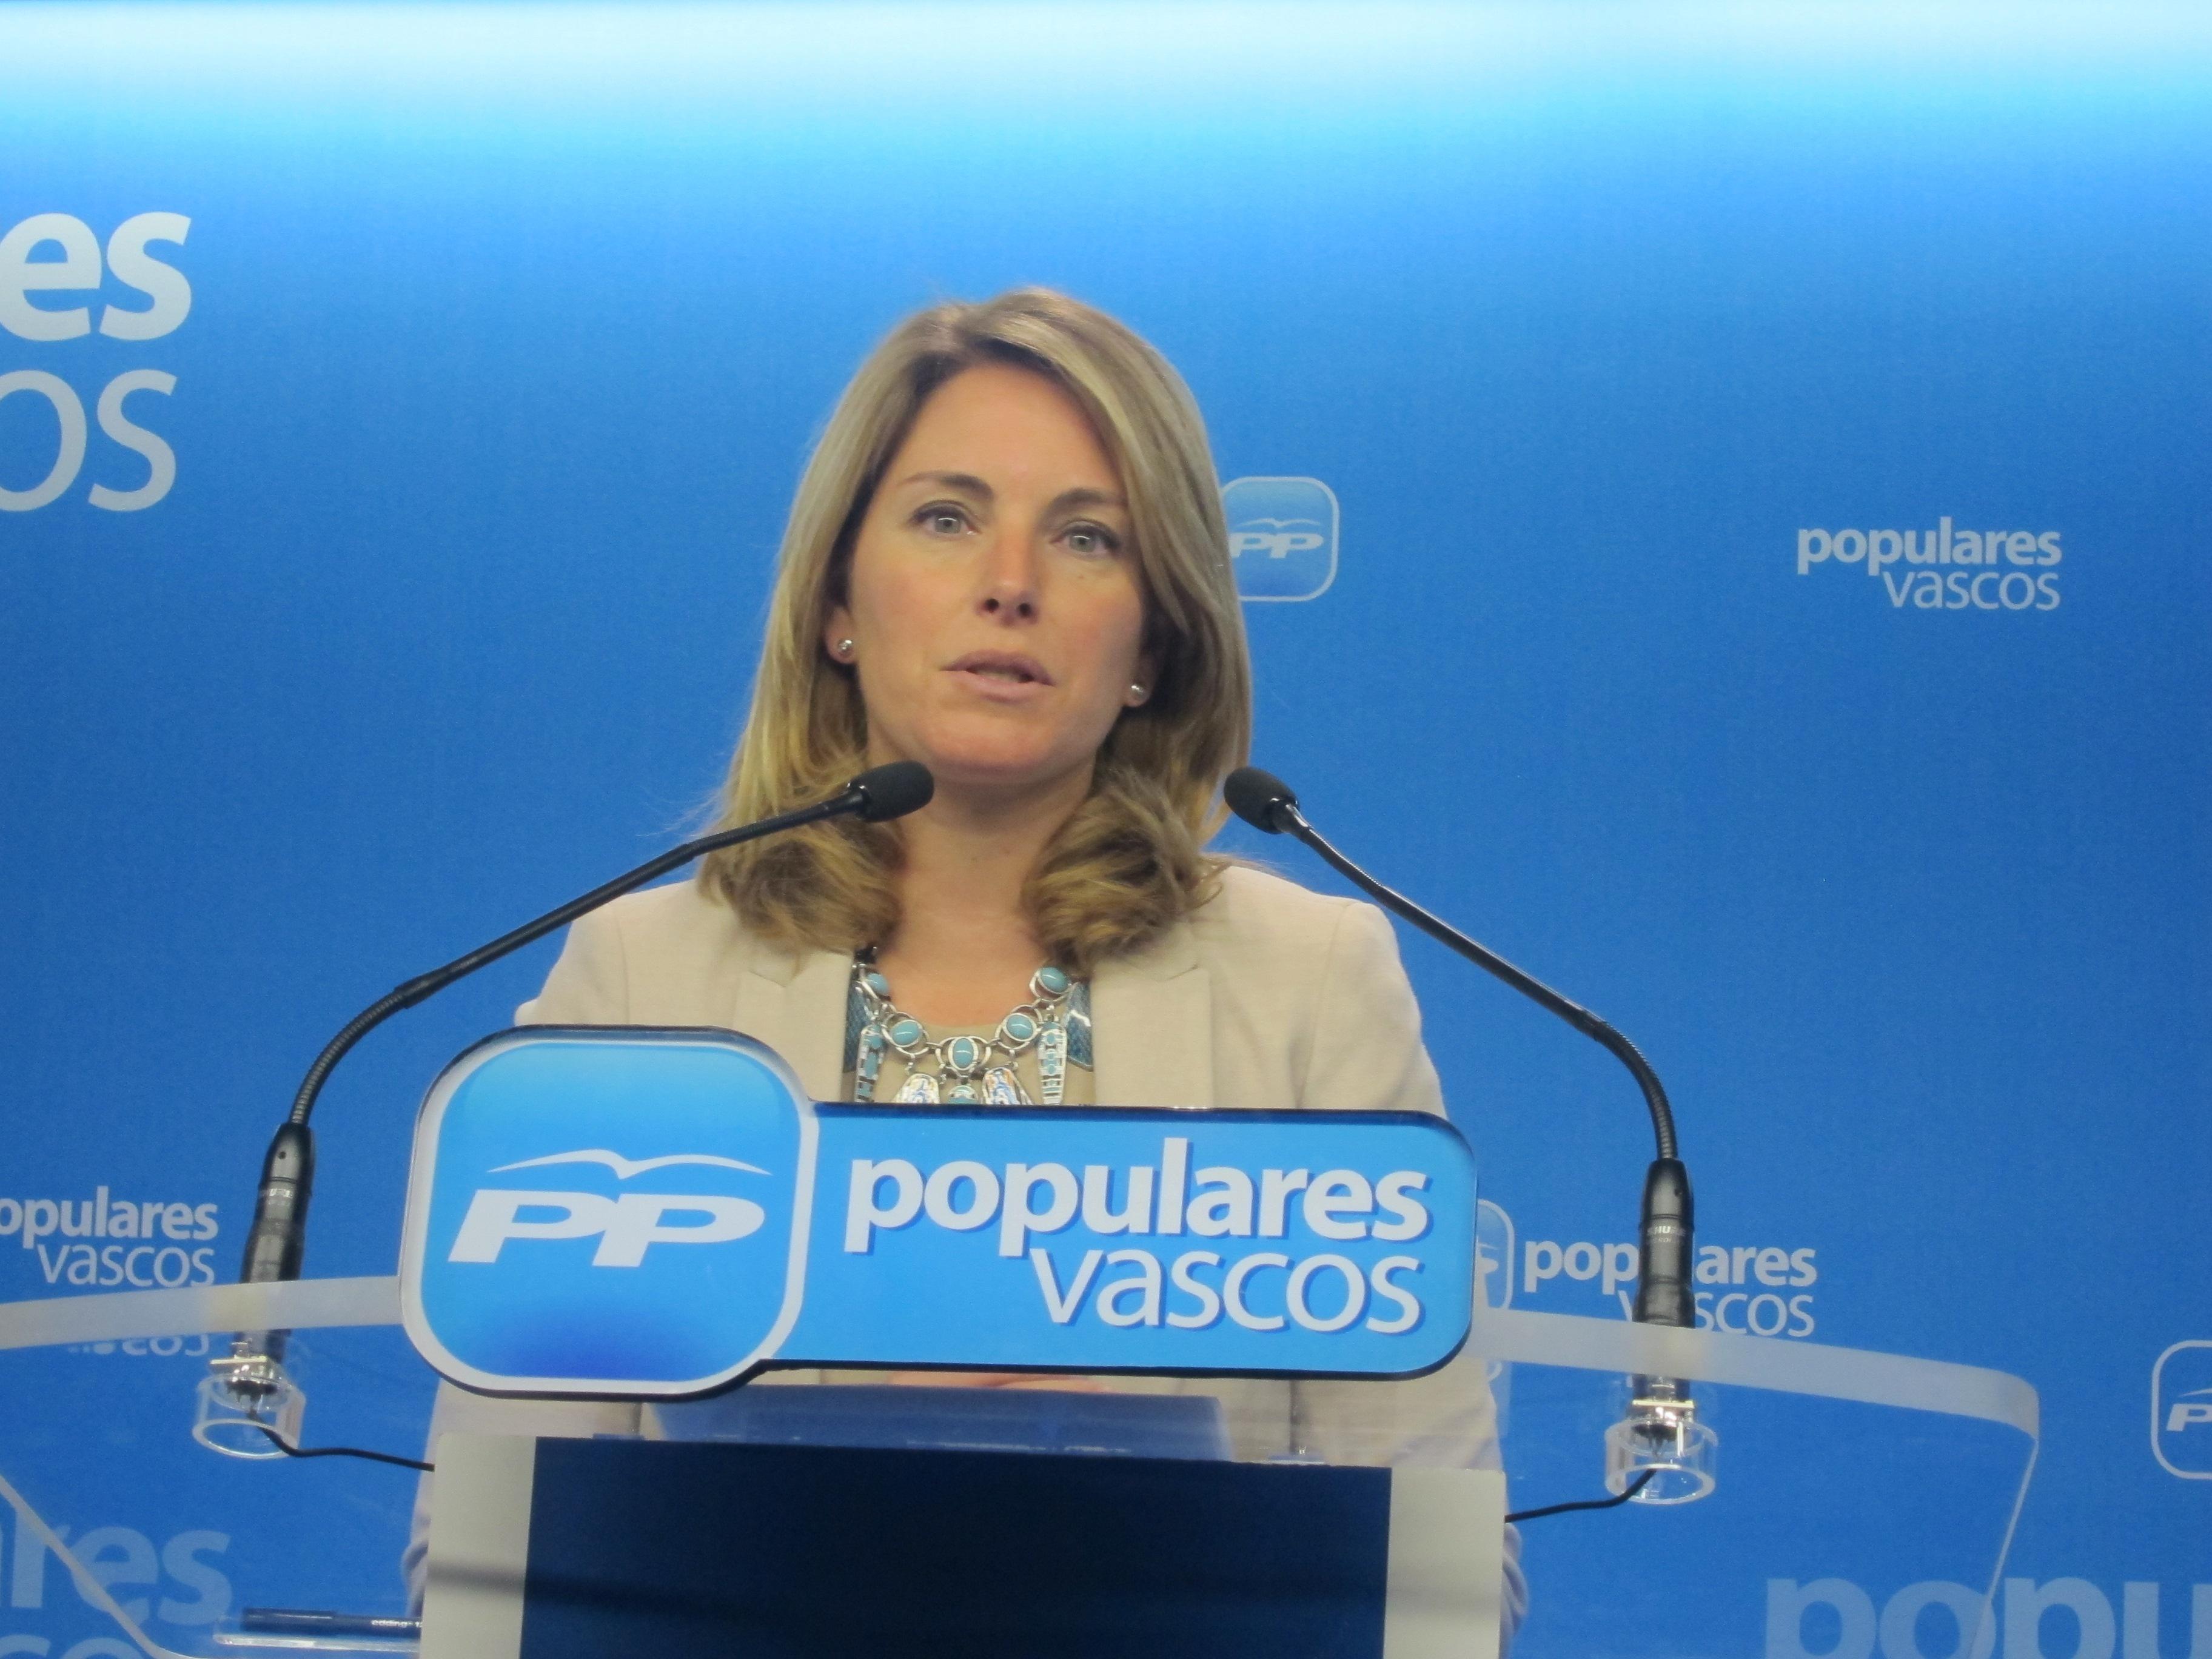 Hacienda da garantías al PP vasco de que no perjudicará el régimen foral vasco